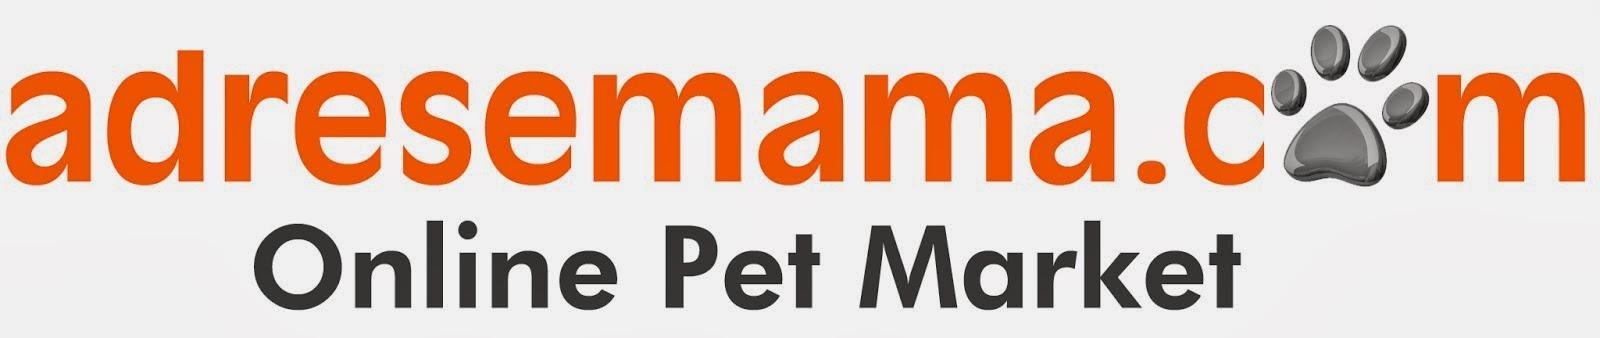 Adrese Mama Destek